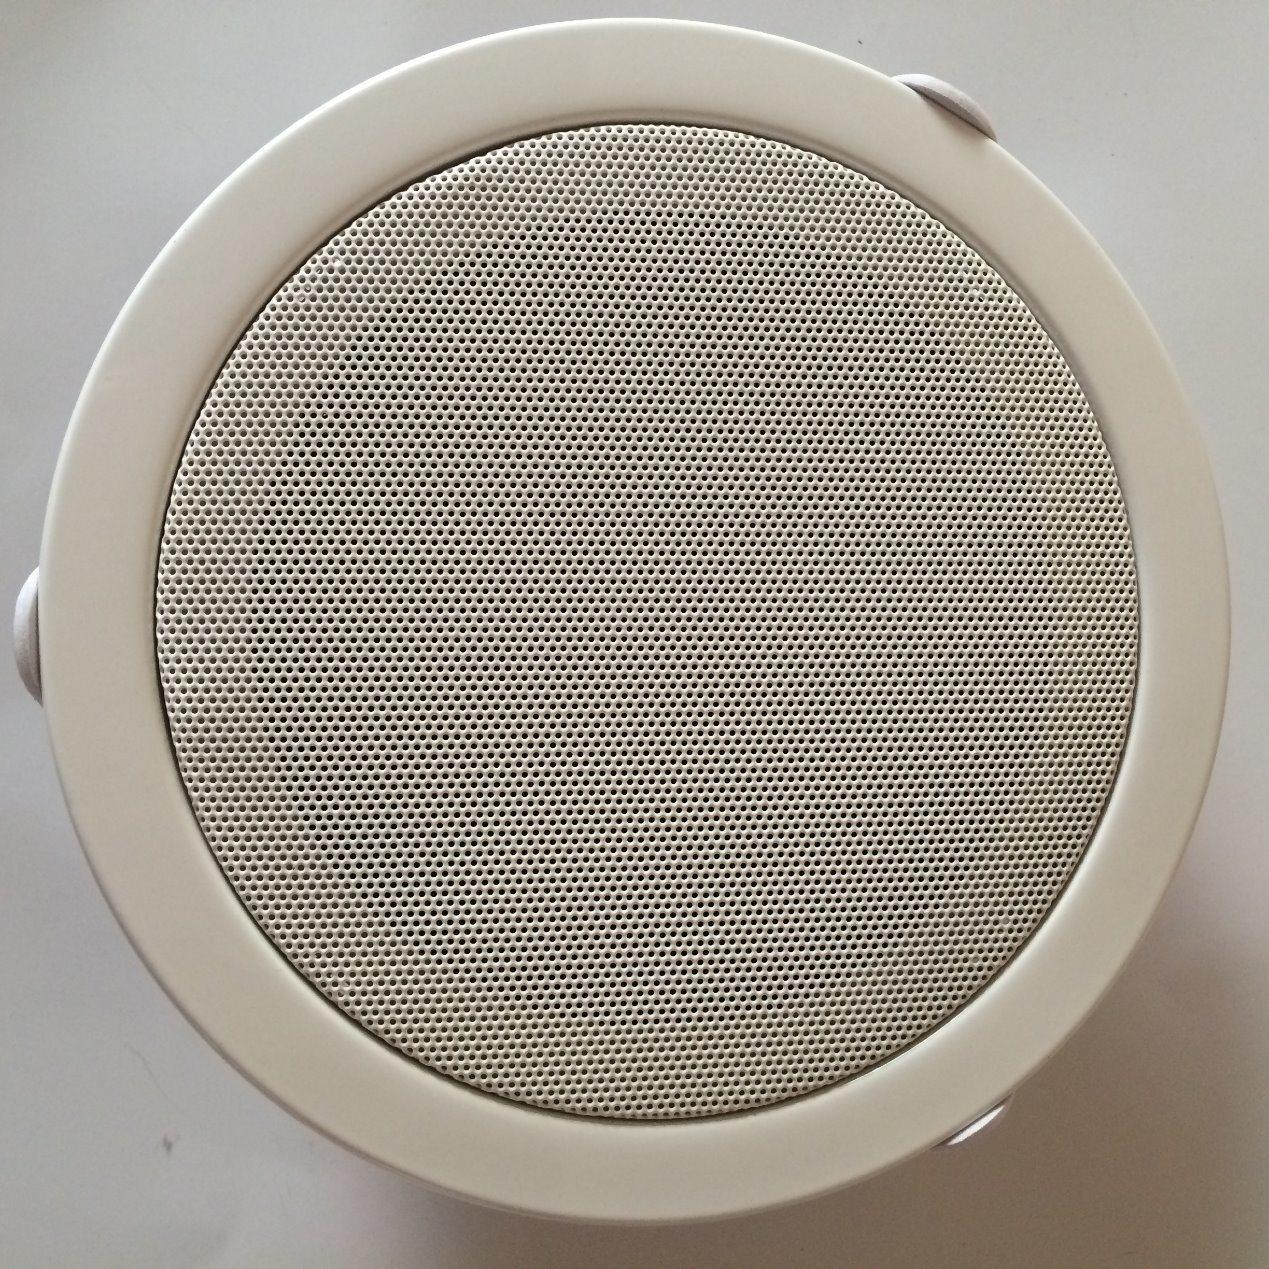 Sp-04 Series Public Address Ceiling Speaker